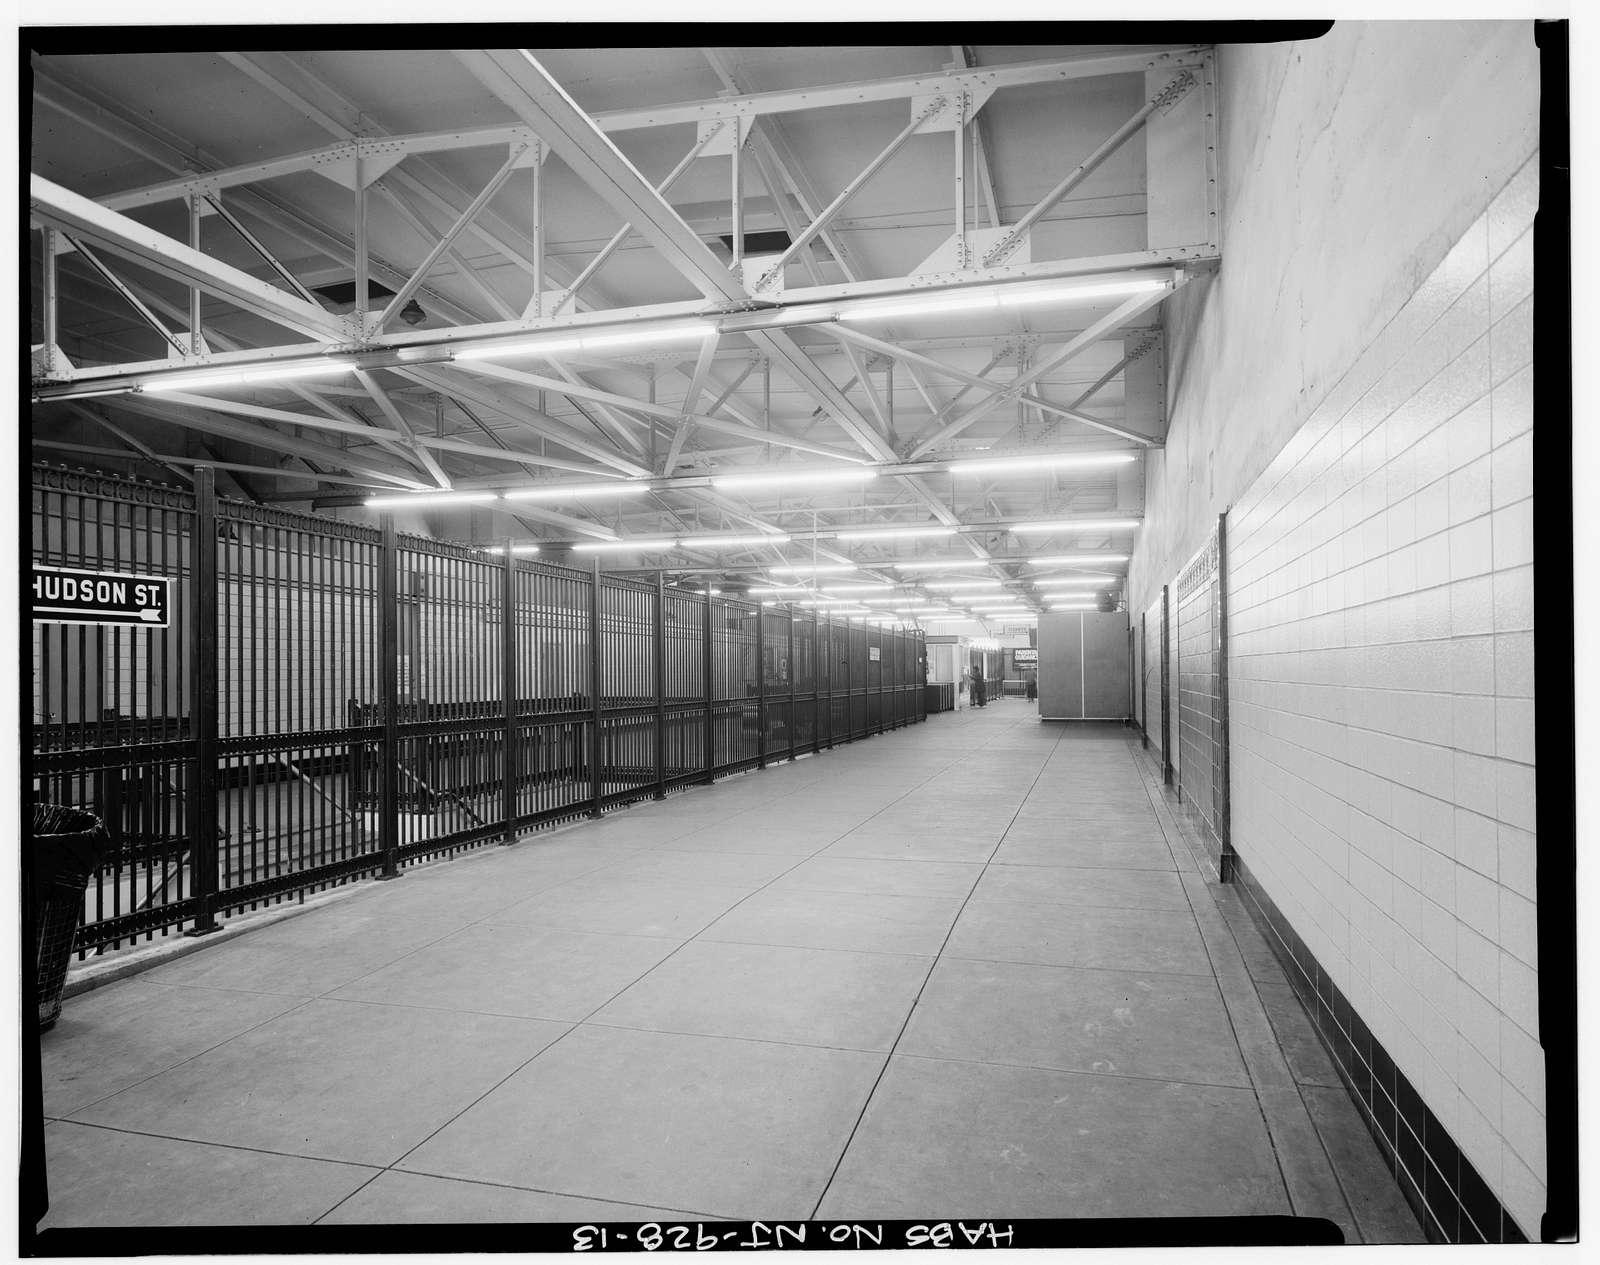 Broadway Subway Station, 30-32 & 33-37 South Broadway, Camden, Camden County, NJ